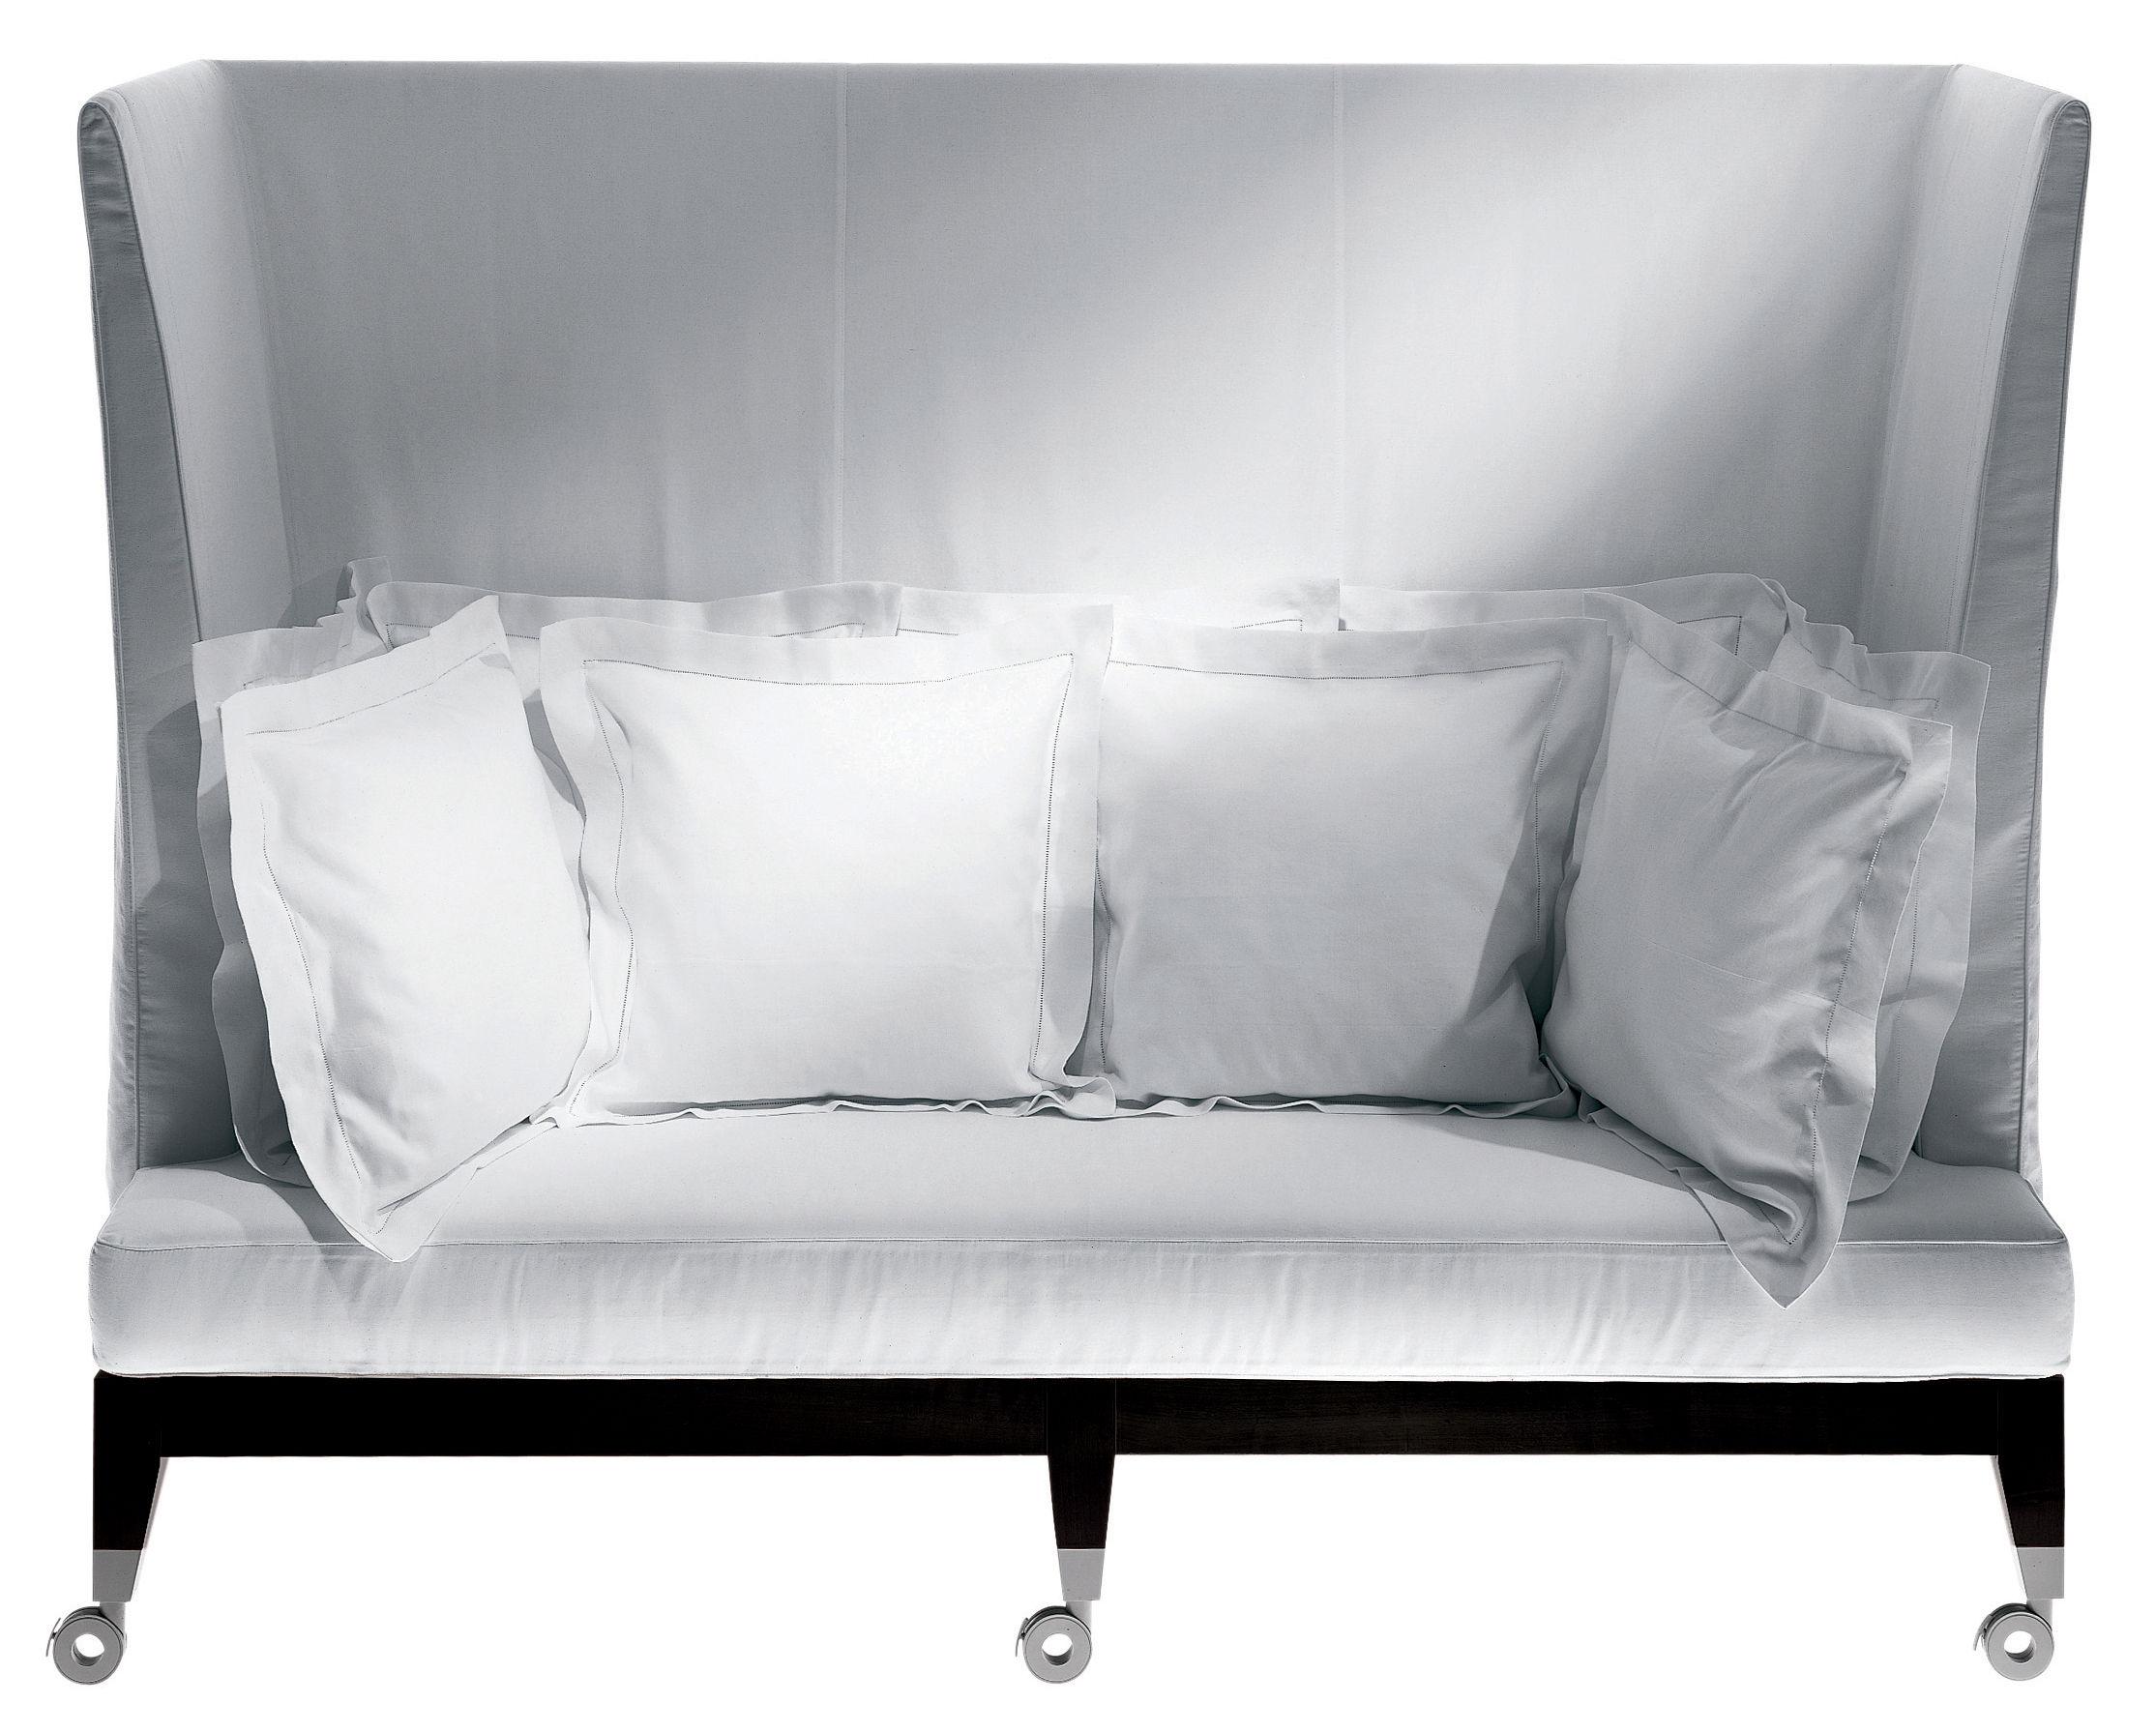 Leinen Möbel Sofas Neoz Sofa Hohe Lehne Driade Ebenholz Aluminium